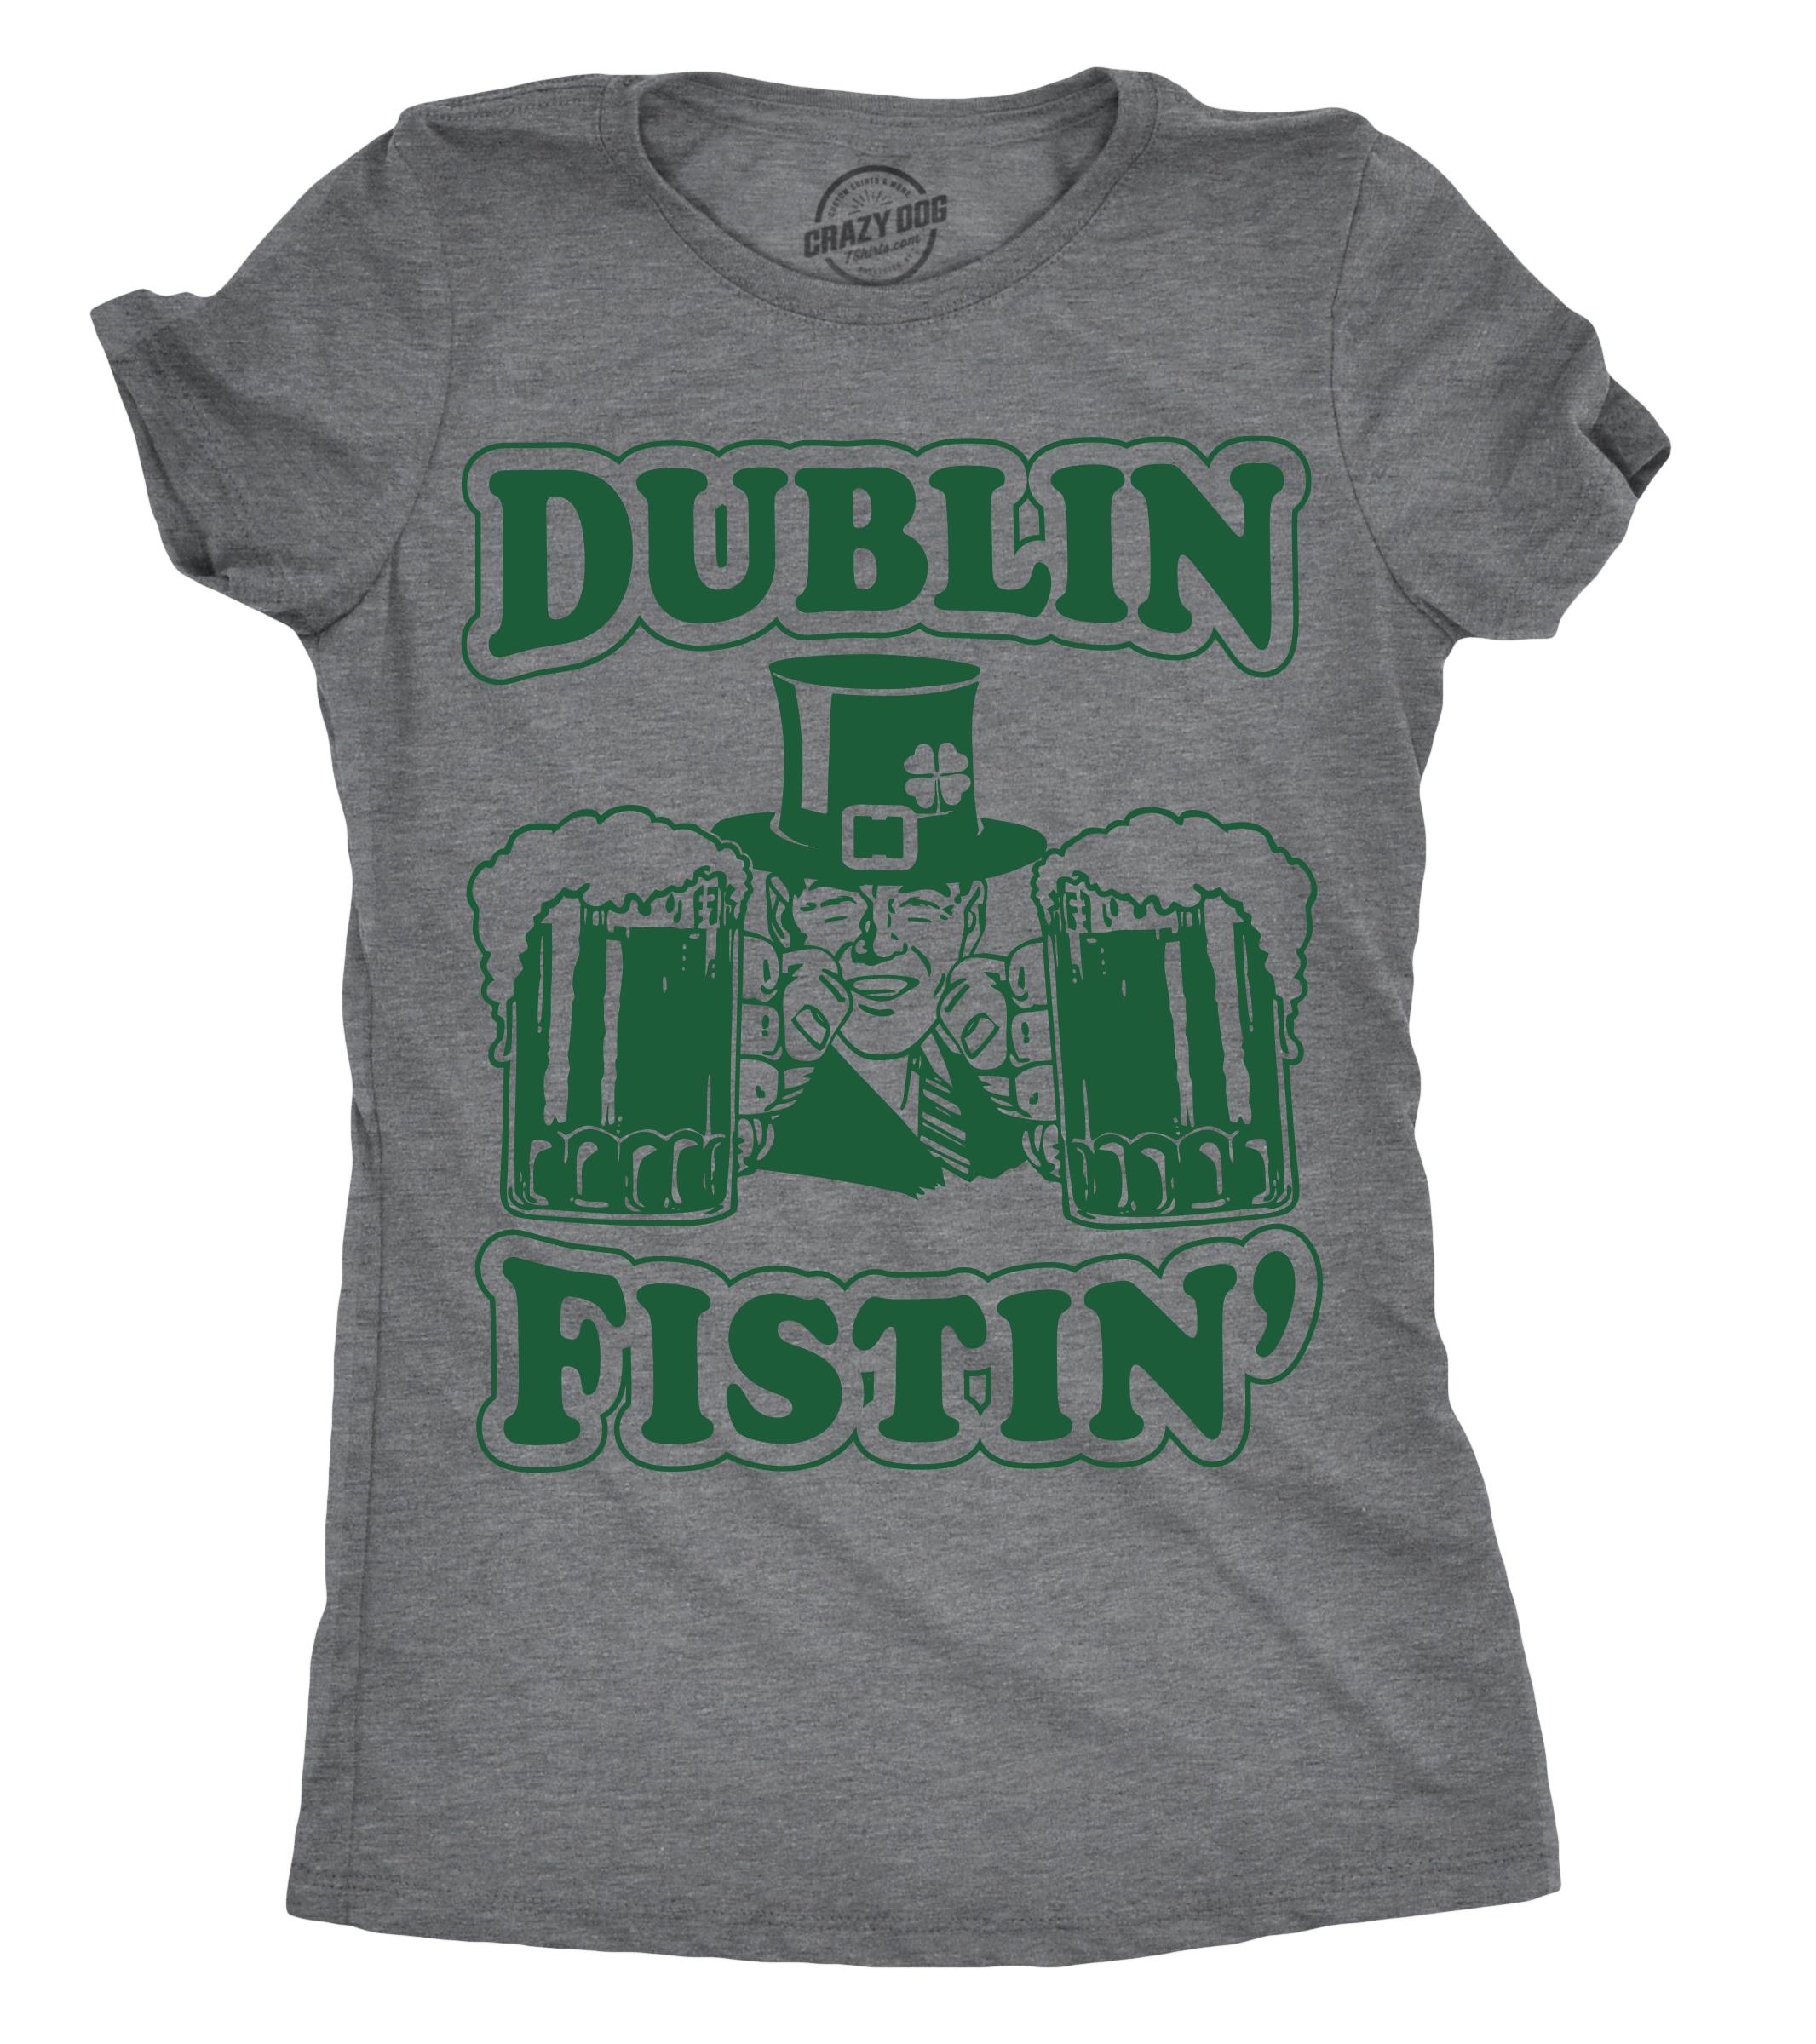 acab172bdbb Patricks Pregnancy Announcement T Shirt Crazy Dog Tshirts Tops   Tees Maternity  Irish I Could Drink Funny St